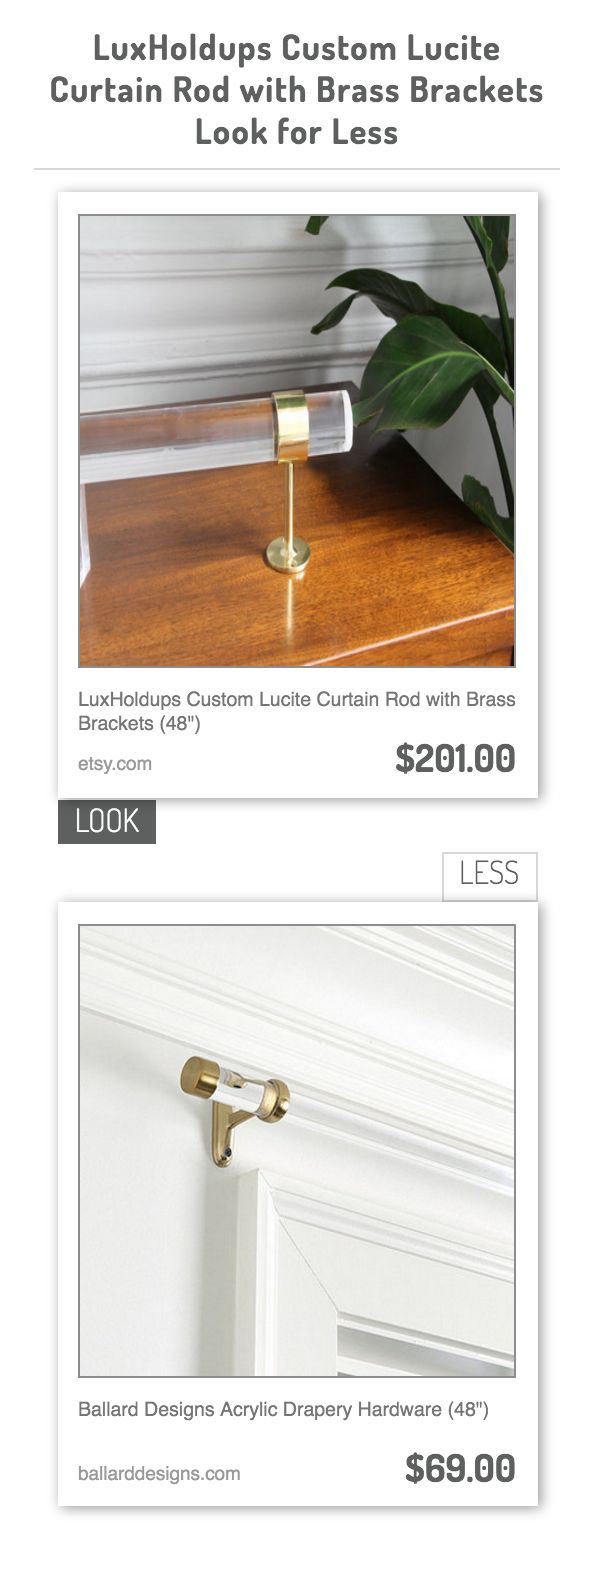 Bay windows and corner curtain rods apps directories - Luxholdups Custom Lucite Curtain Rod With Brass Brackets Vs Ballard Designs Acrylic Drapery Hardware